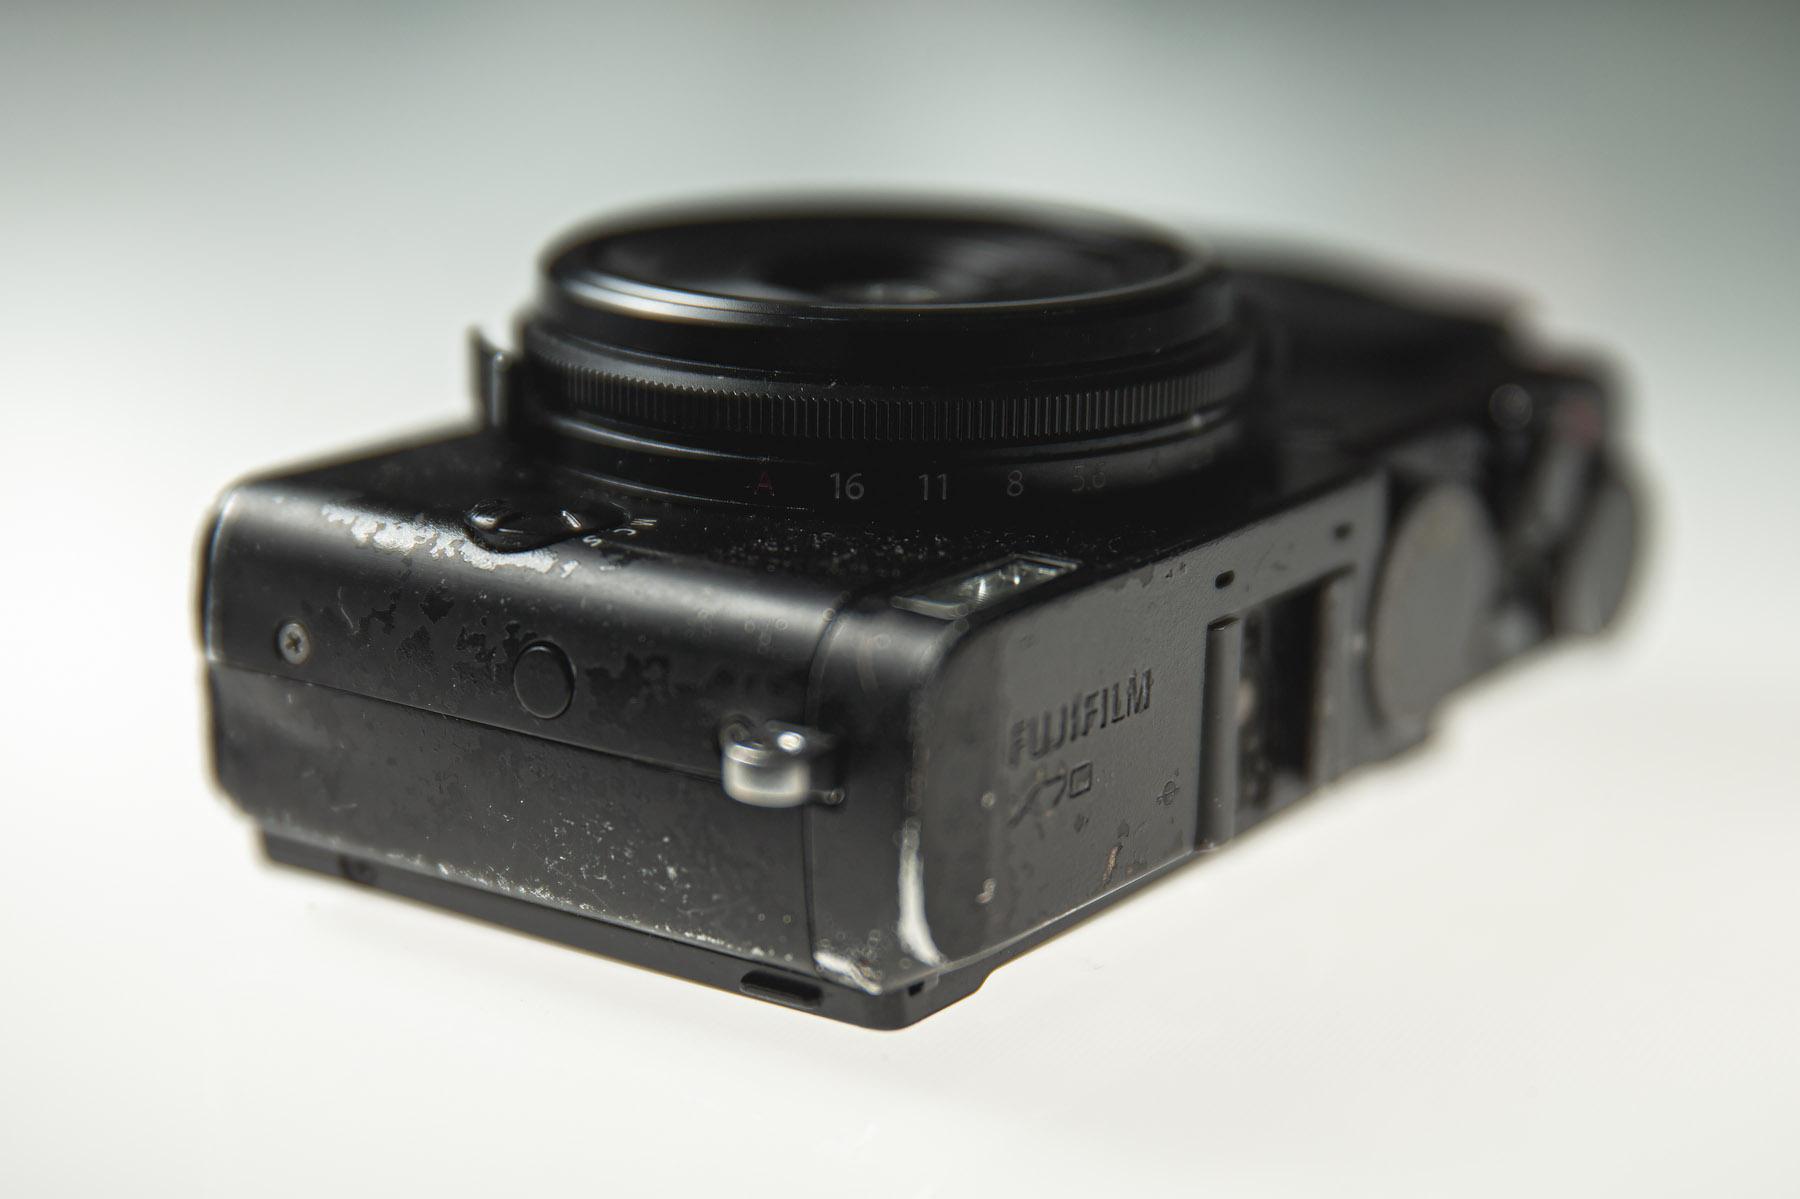 lakschade camera, lakschade, fujifilm x70 lakschade, fujifilm x70, aandachtspunten tweedehands camera